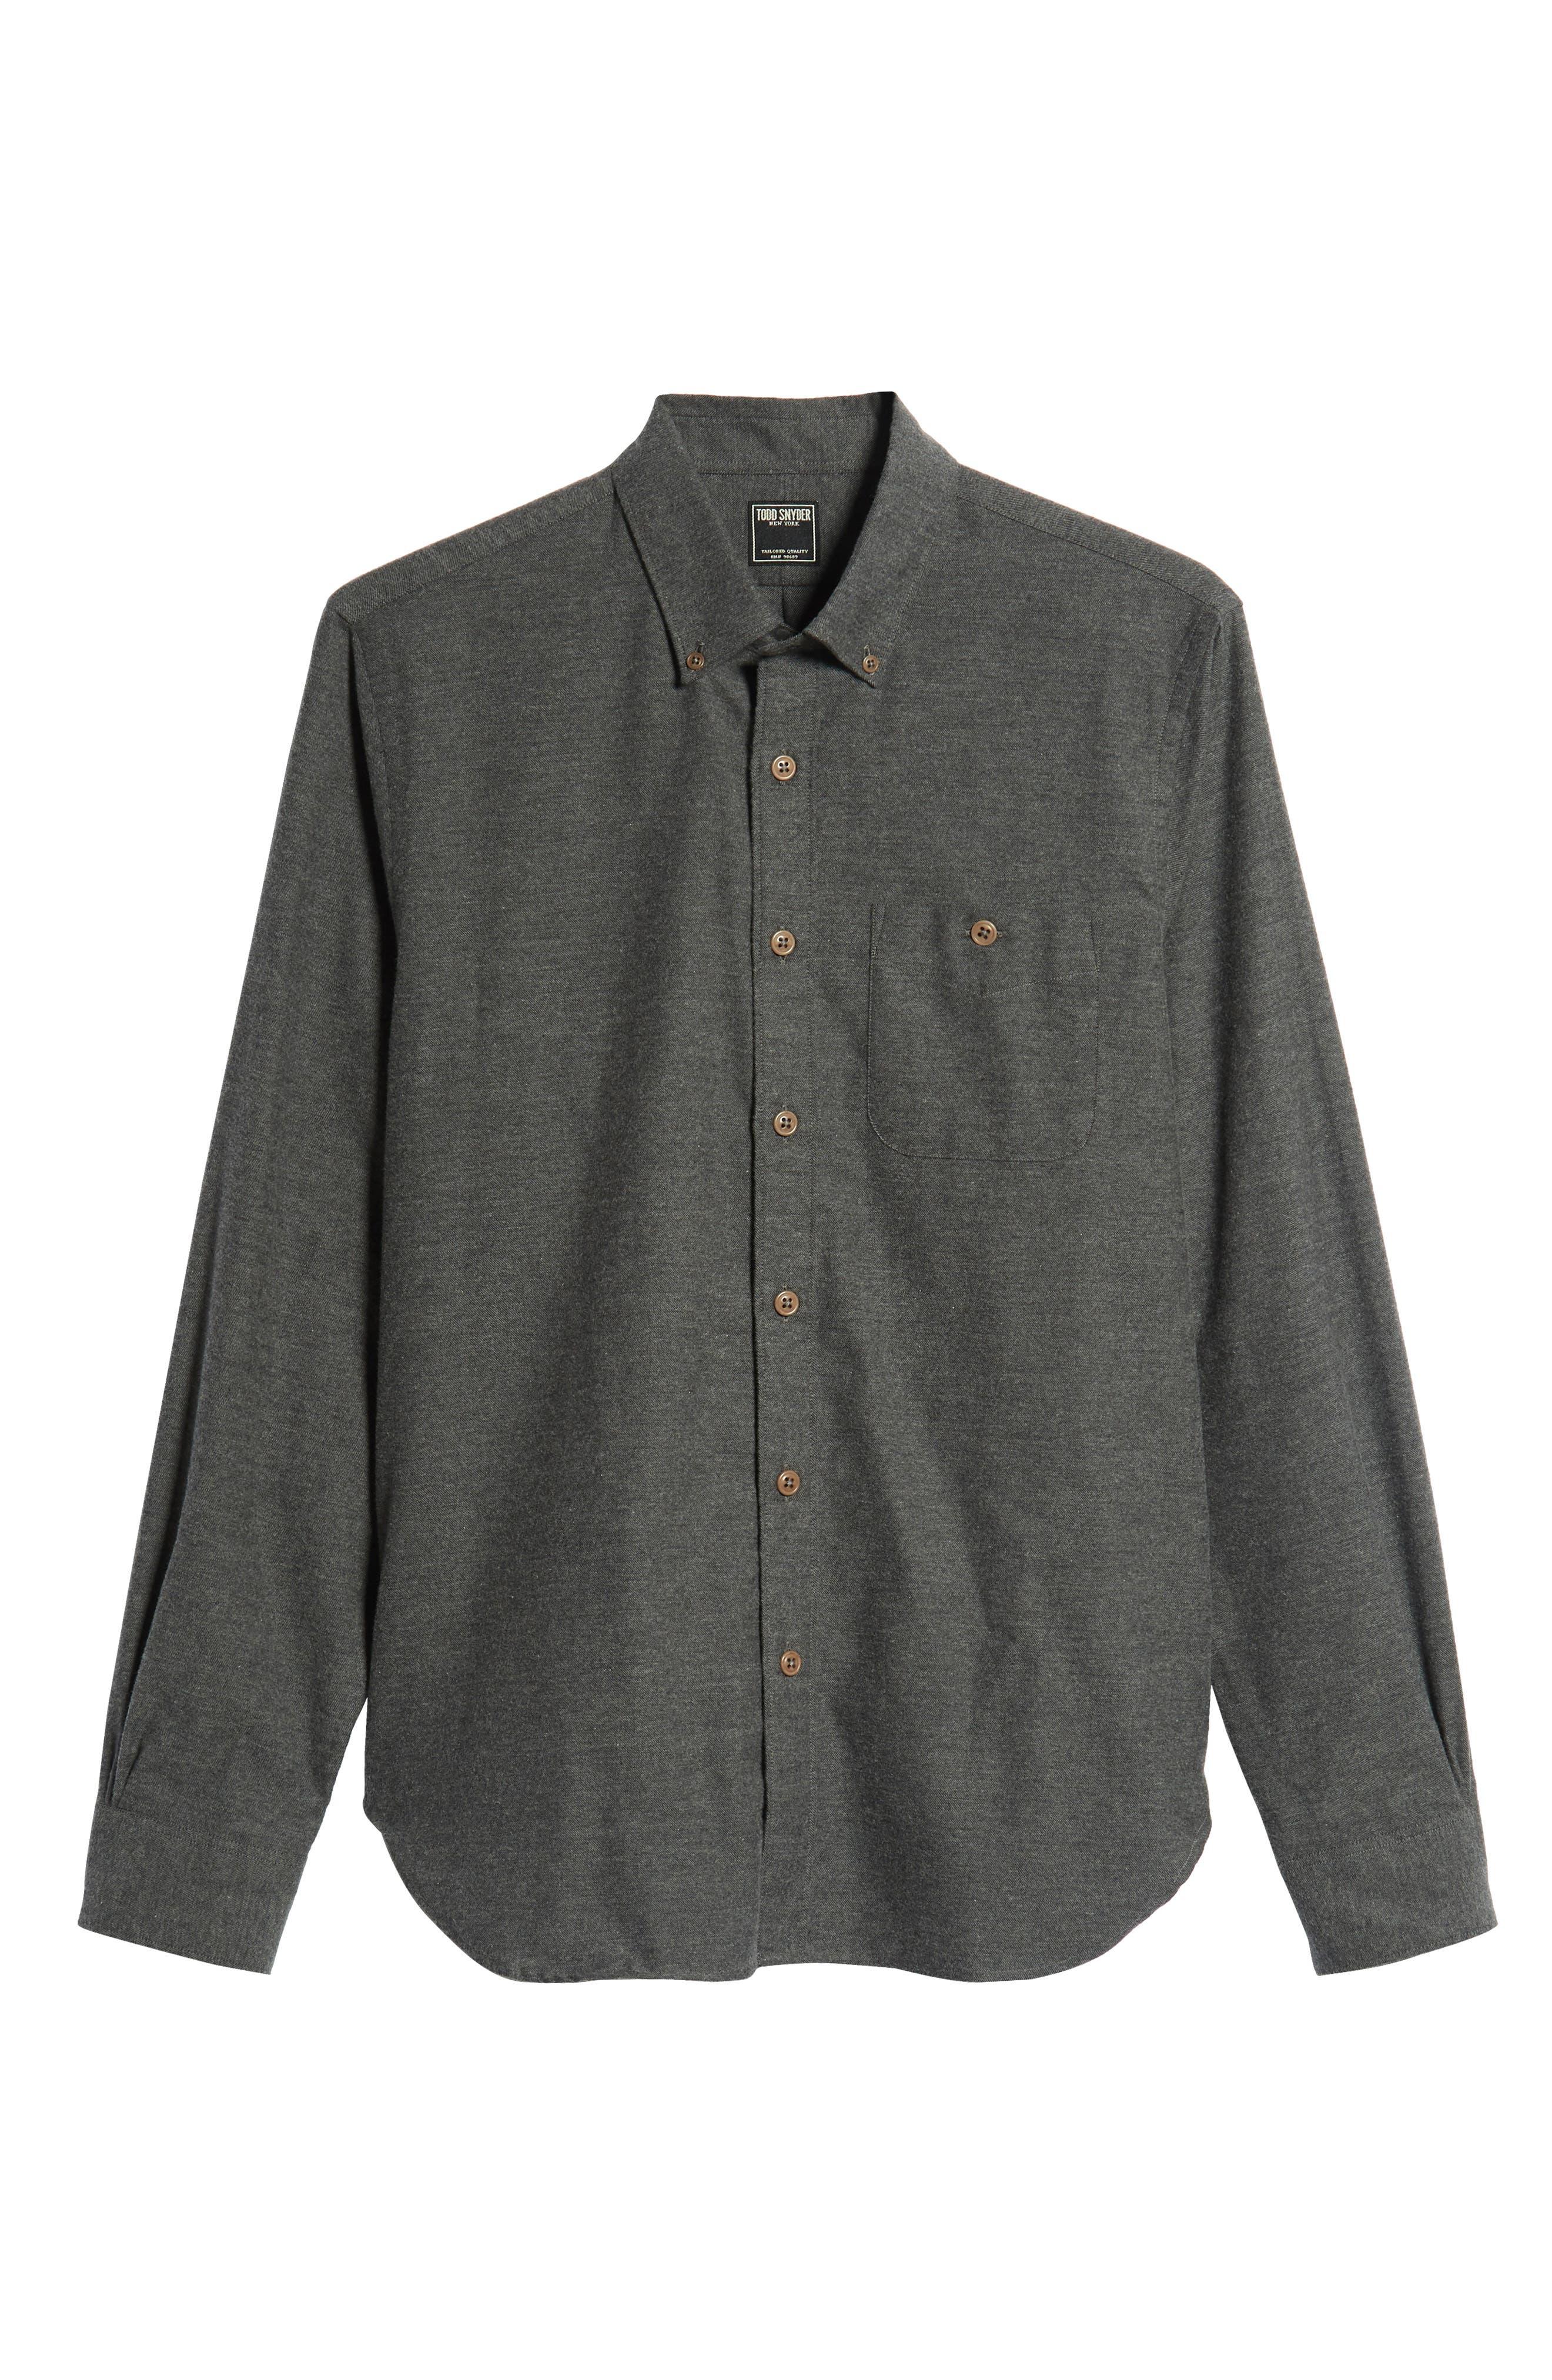 Brushed Cotton & Cashmere Twill Sport Shirt,                             Alternate thumbnail 5, color,                             020